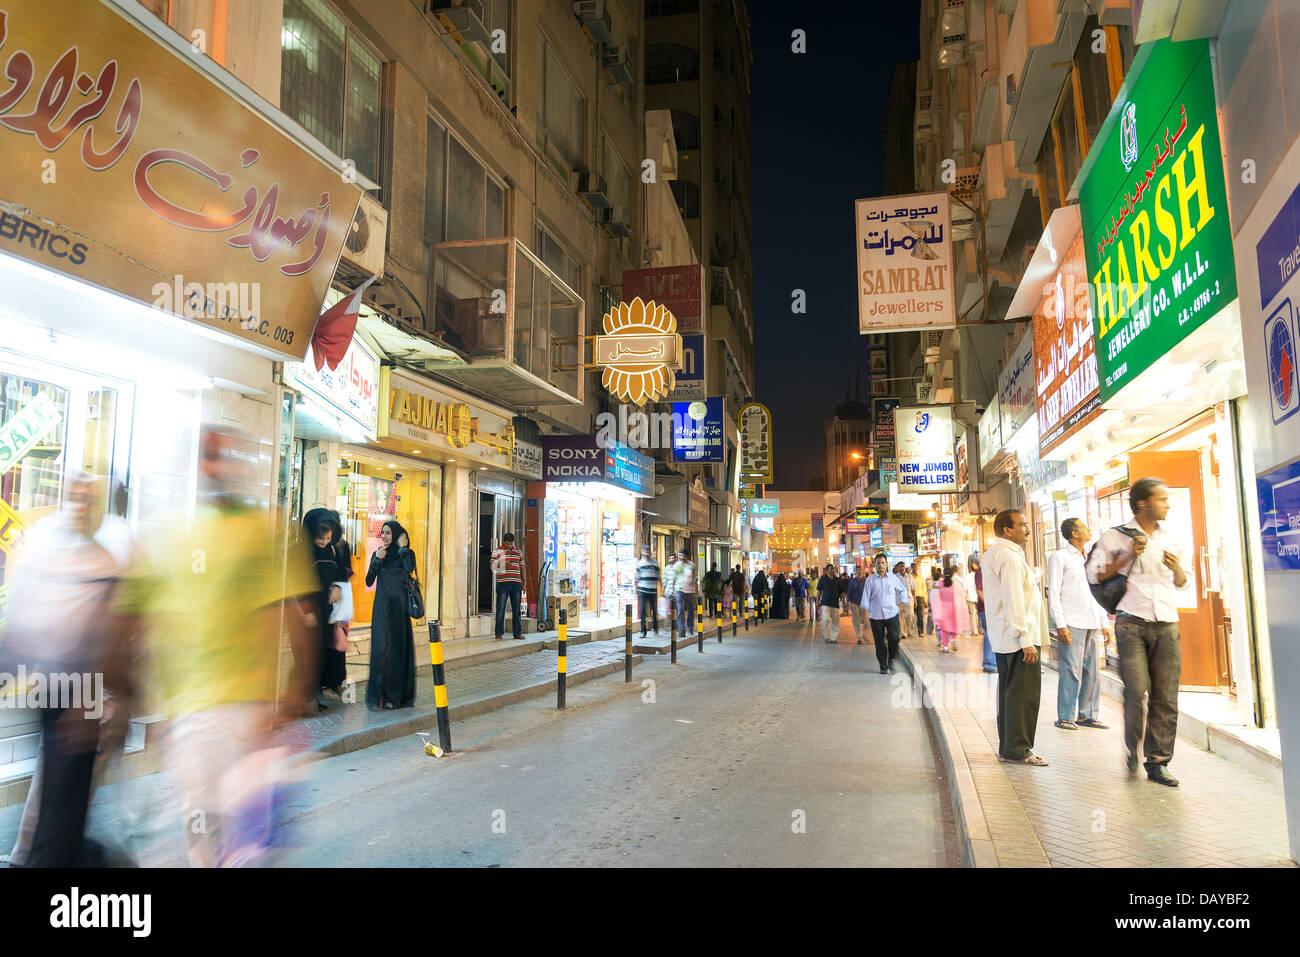 souk in manama bahrain - Stock Image